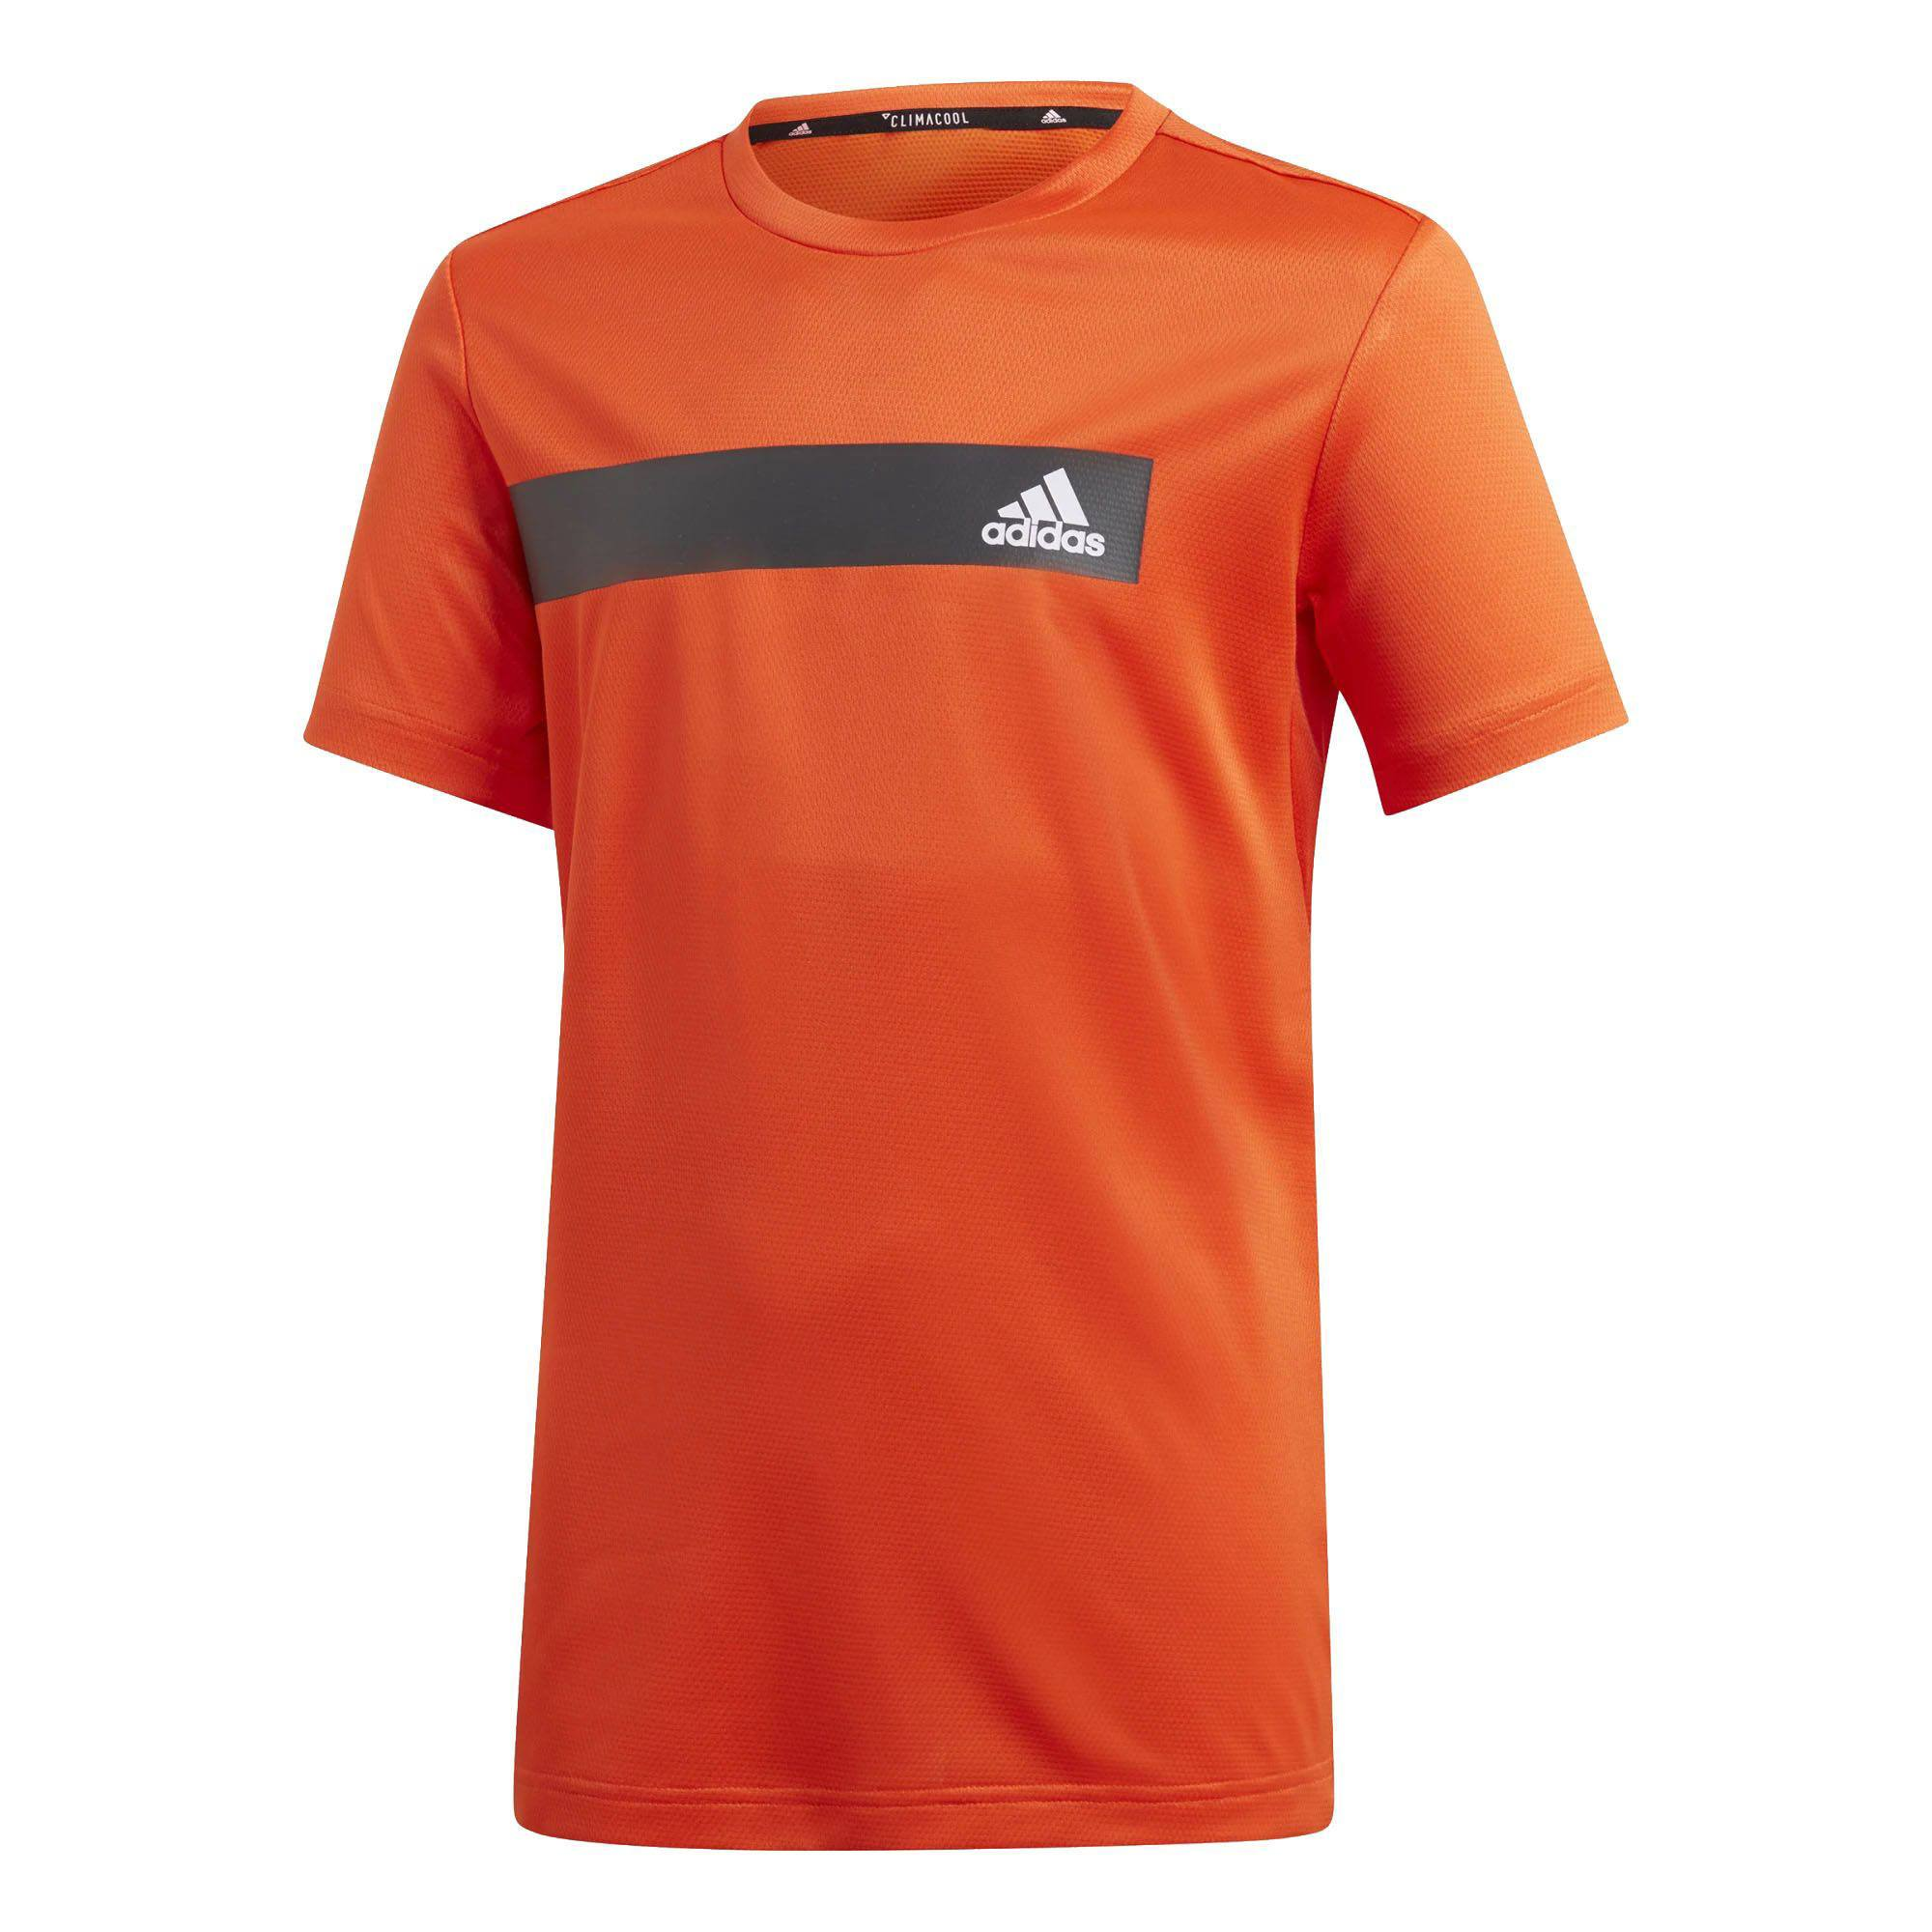 Camiseta Adidas Yb Tr Cool Tee Infantil